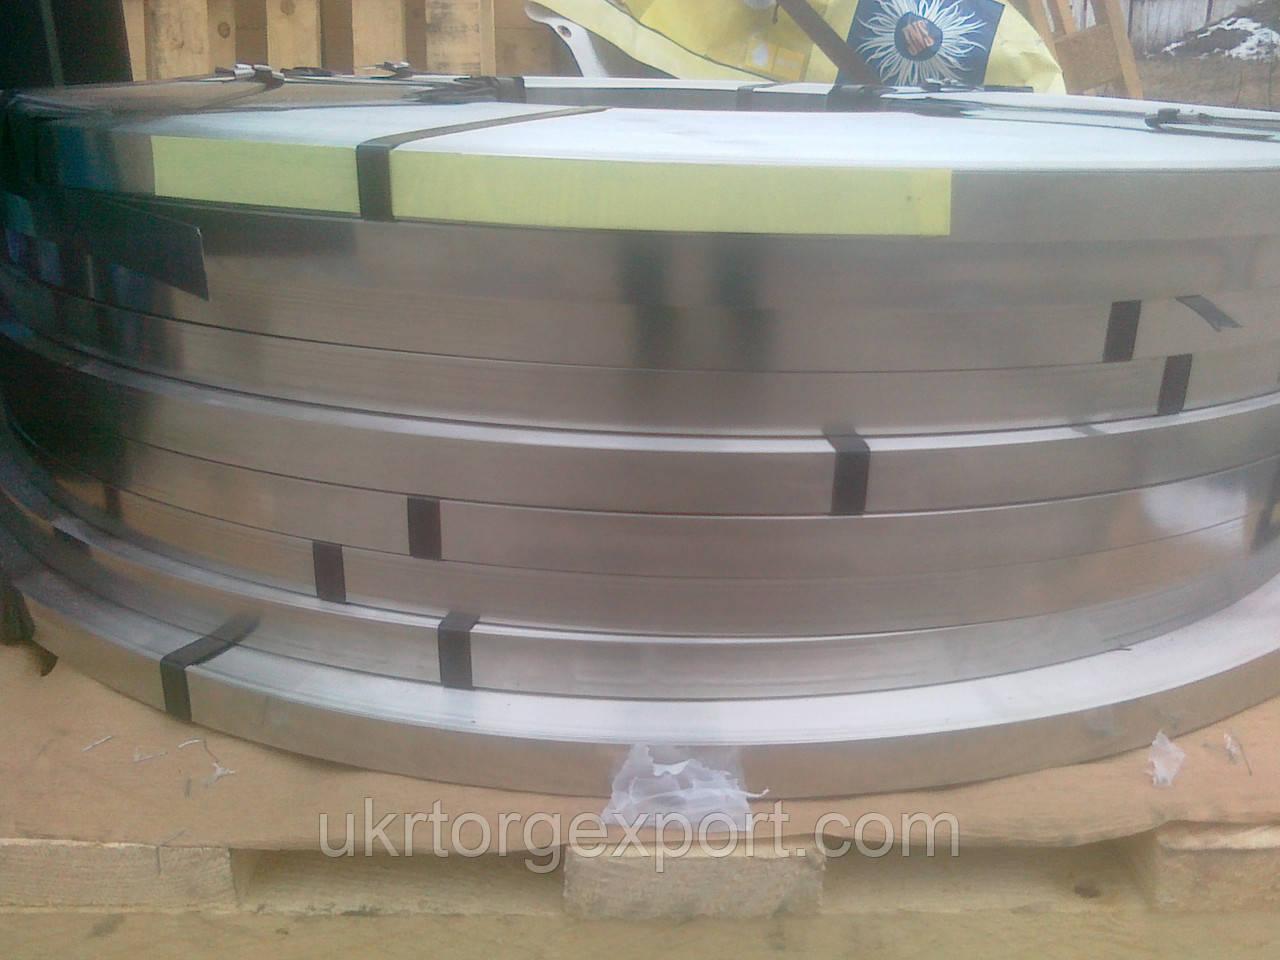 Лента фехраль Х23Ю5Т (OCr23Al5) 0,15*2,0 мм